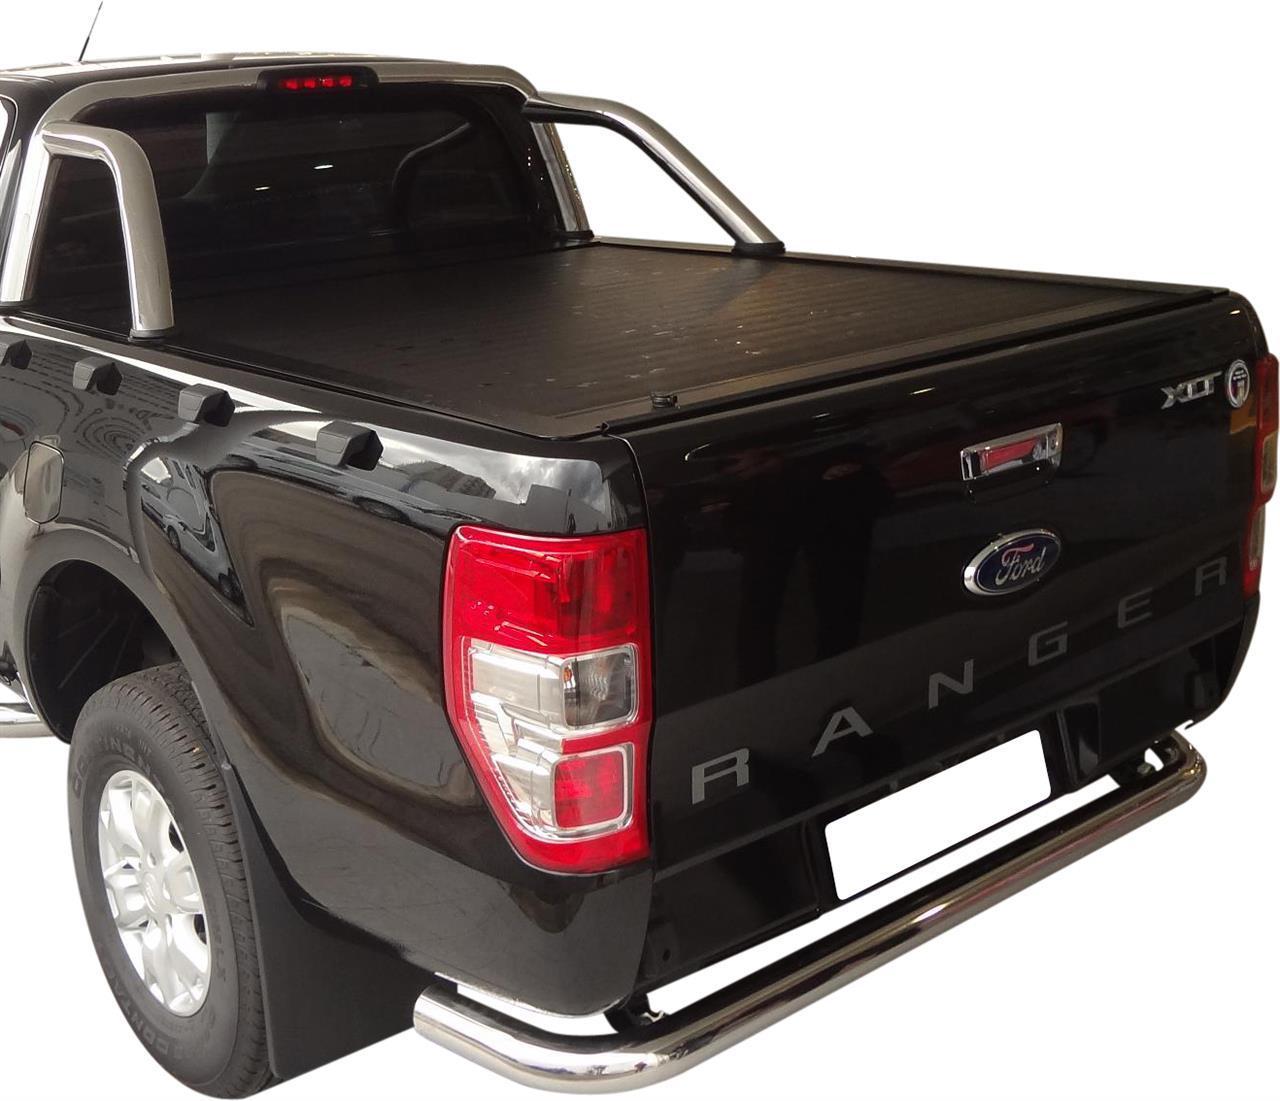 couvre benne retractable ford ranger 2012 double cab arceau inox origine. Black Bedroom Furniture Sets. Home Design Ideas